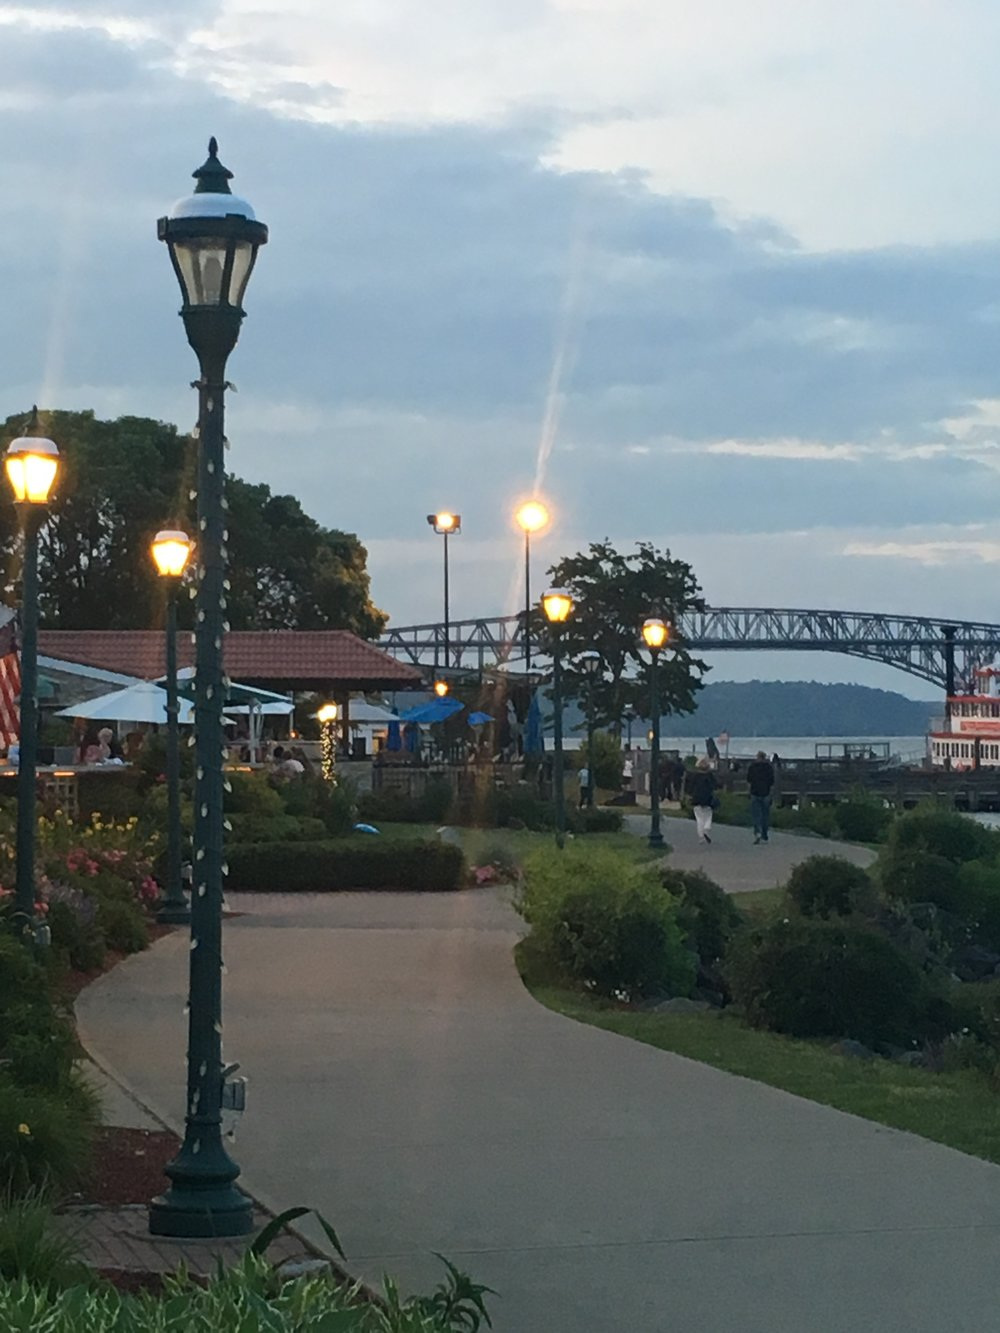 Riverfront and bridge to Beacon